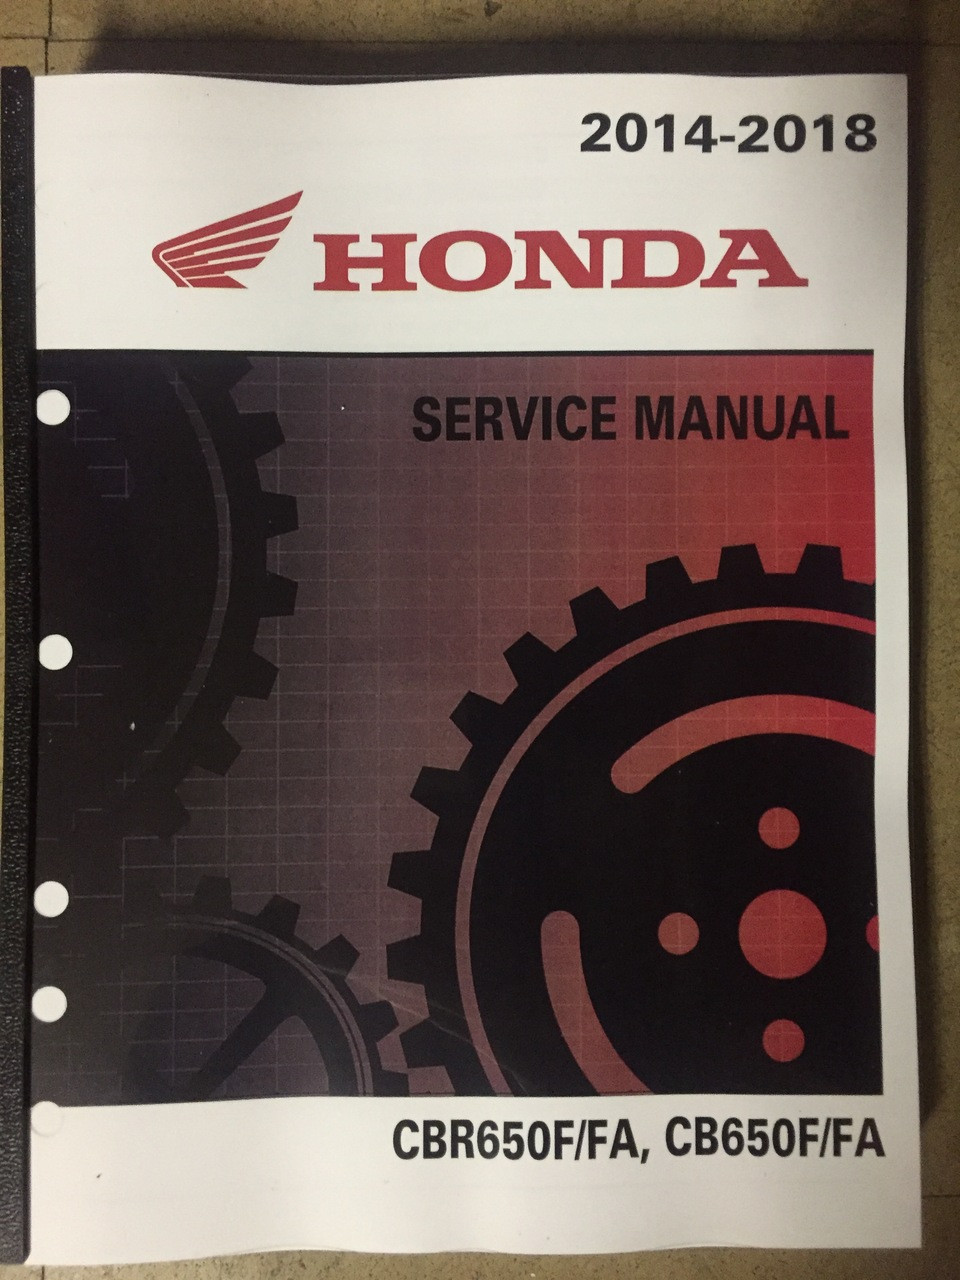 2016 2017 2018 honda cbr650f cbr650fa cb650f cb650fa part rh service shop repair manual com 2014 honda cbr650f owners manual 2018 honda cbr650f owners manual